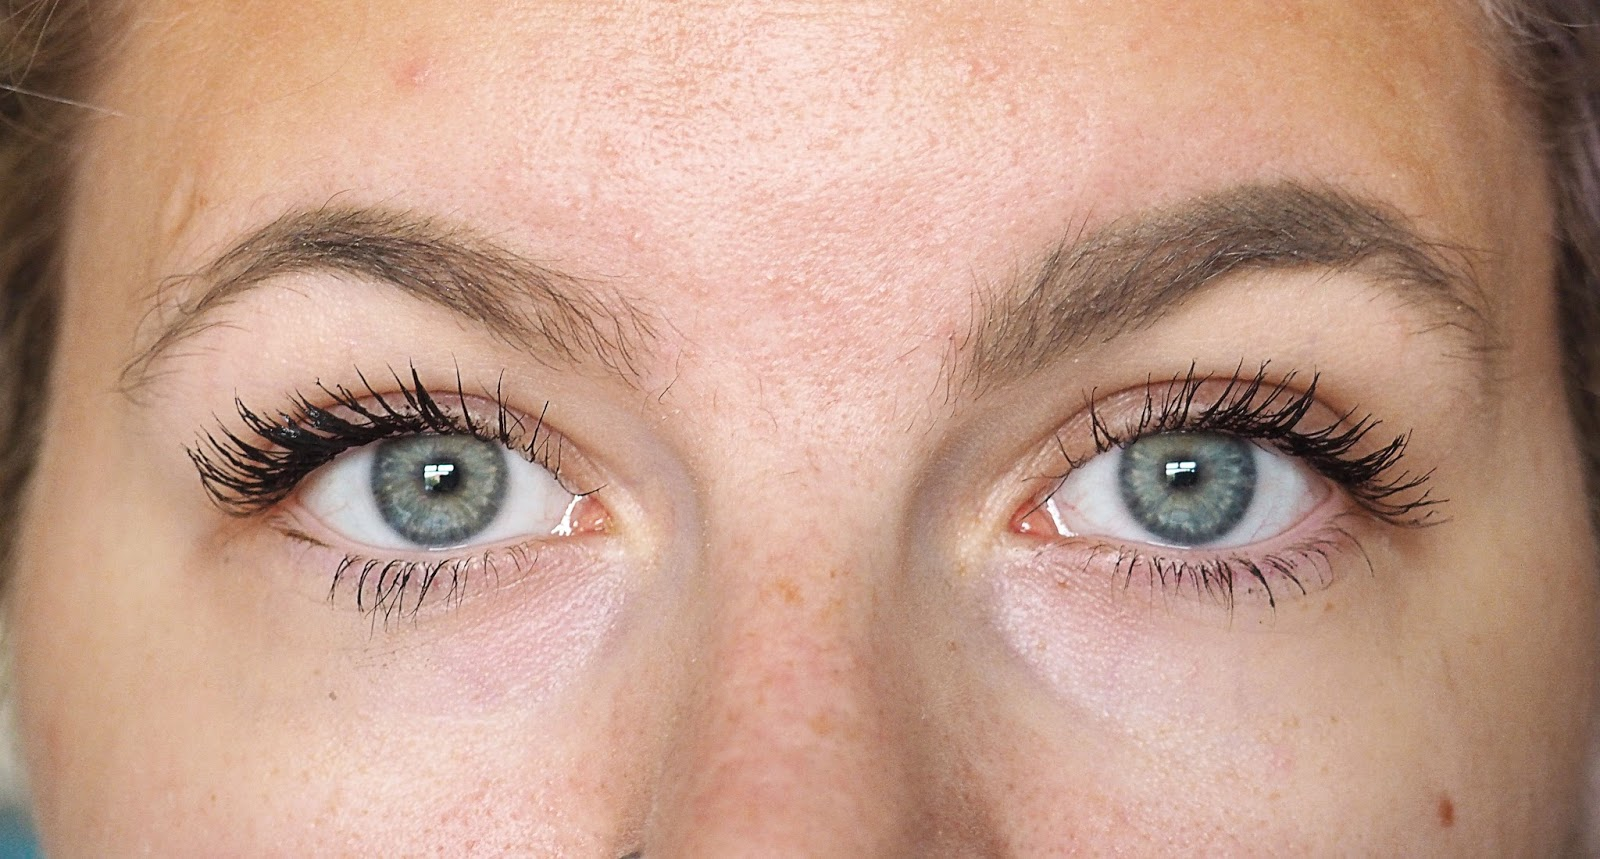 12aa657a091 Left eye - Maybelline Lash Sensational // Right eye - Benefit Roller Lash